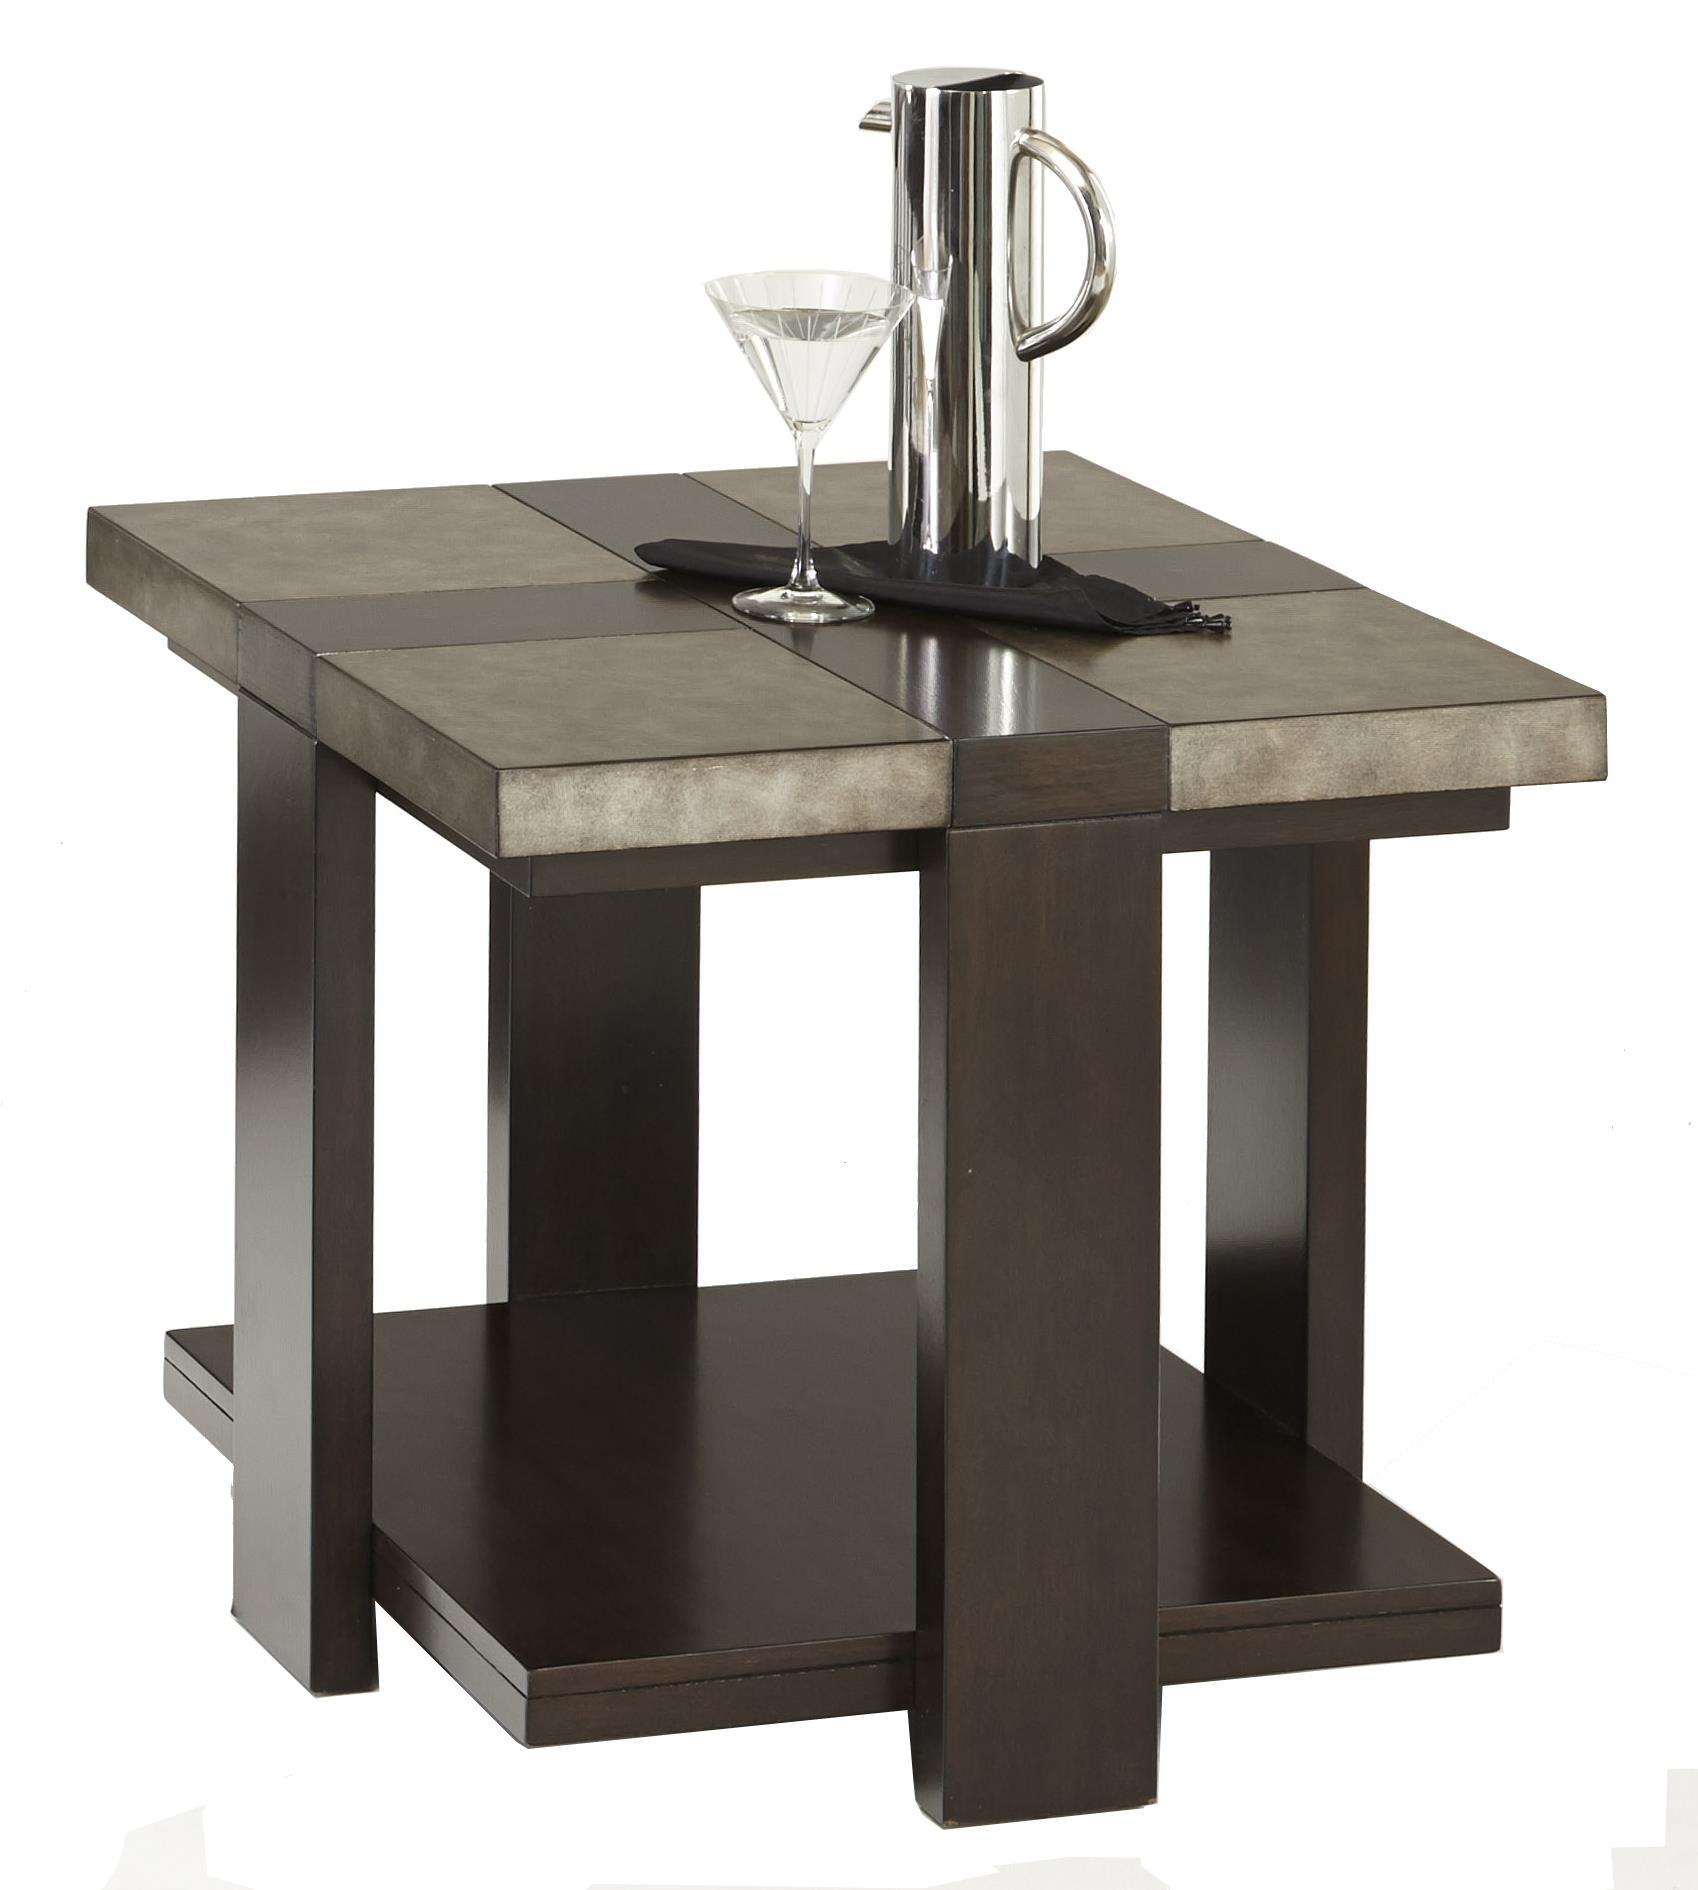 Progressive Furniture Concourse Rectangular End Table - Item Number: P488-04